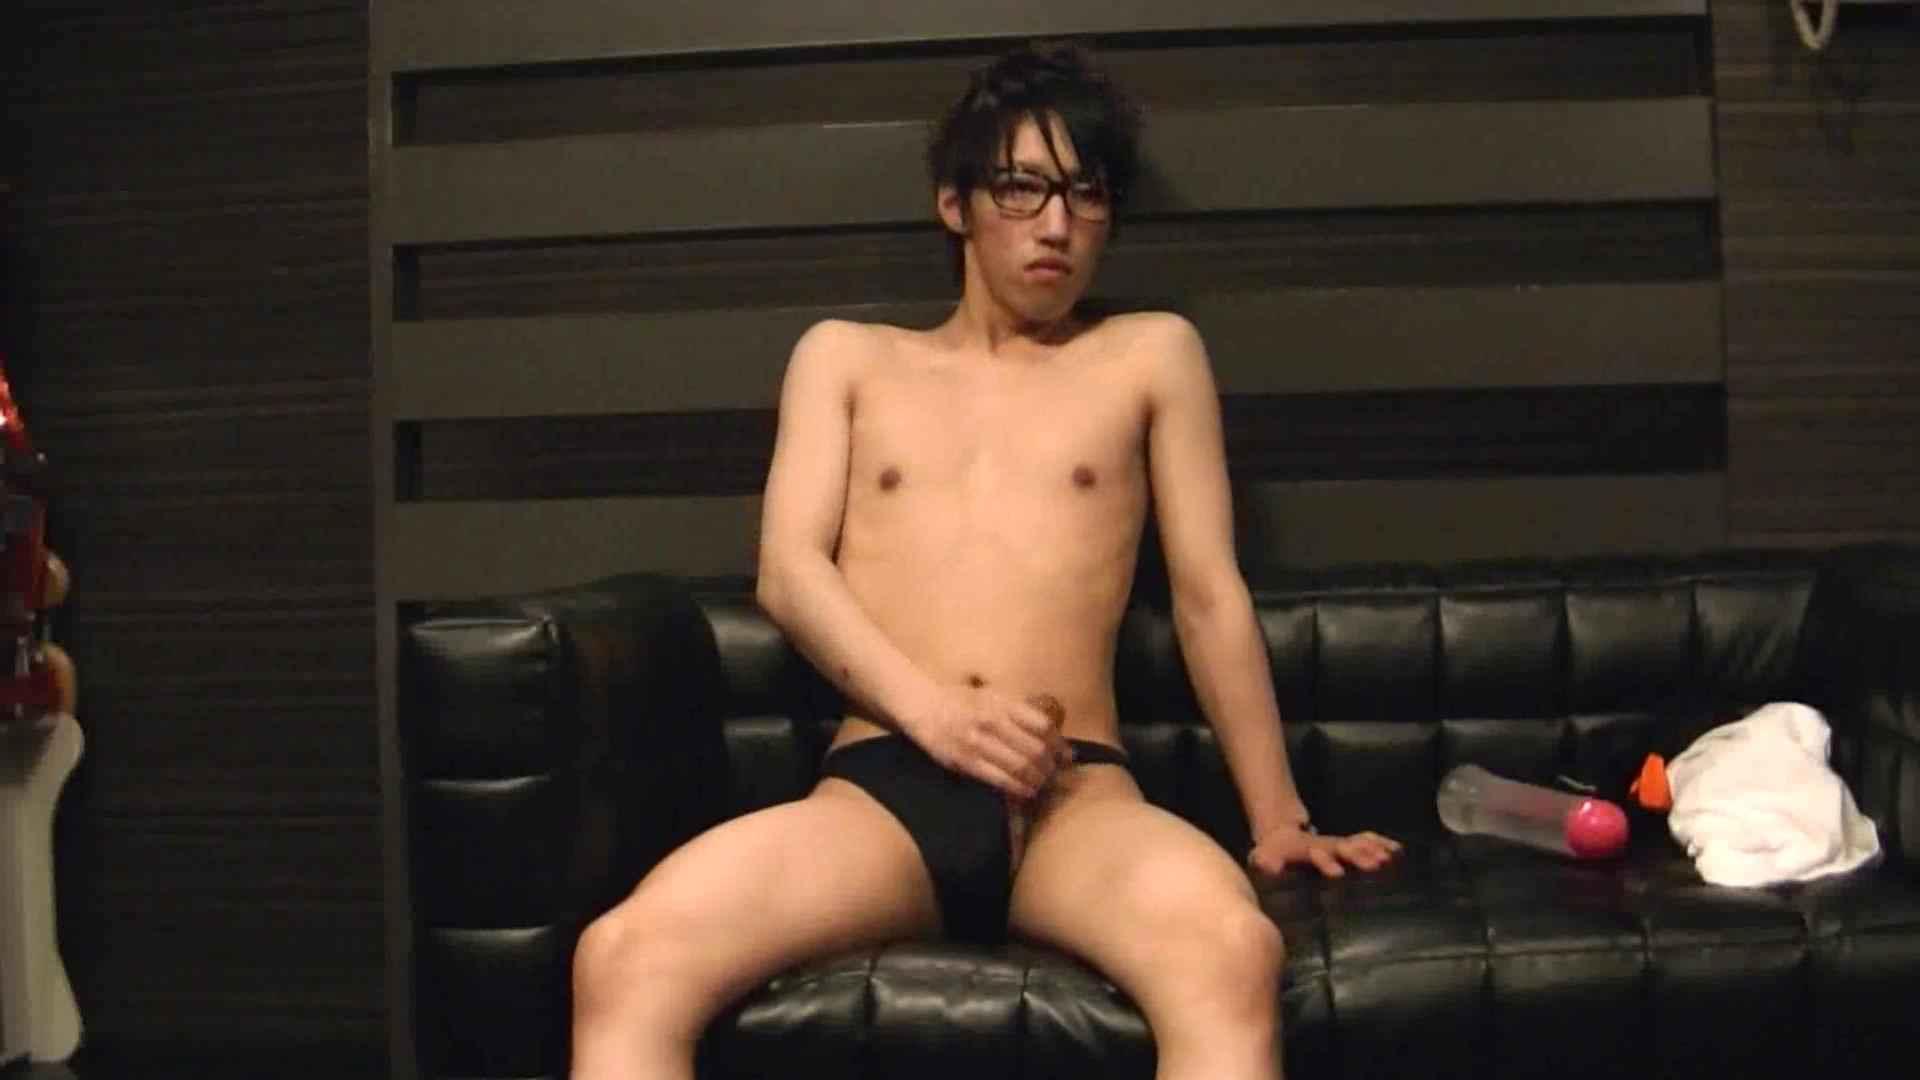 ONA見せカーニバル!! Vol3 男・男 ゲイ無料無修正画像 72pic 27